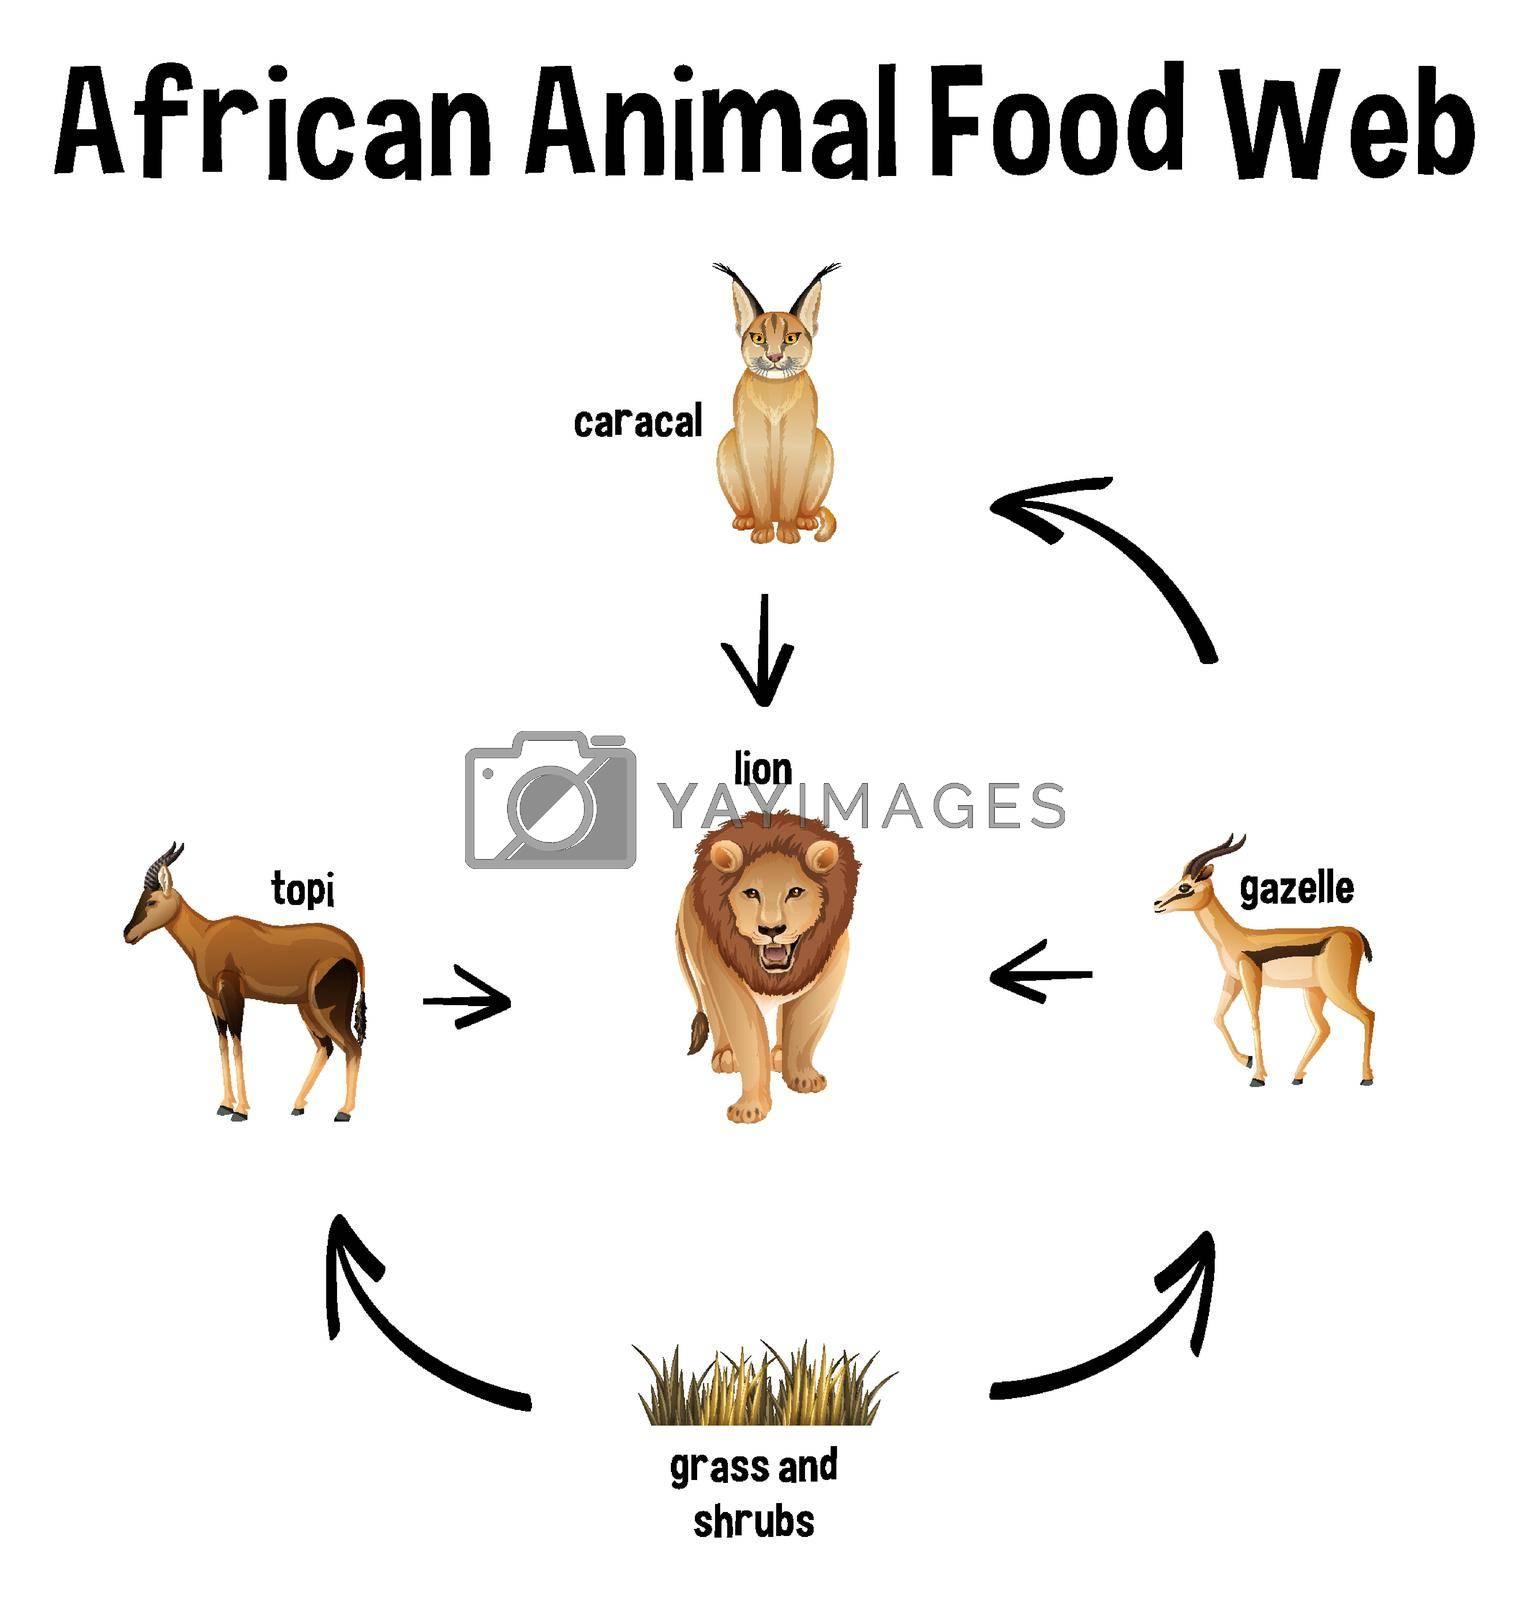 African Animal Food Web for education illustration